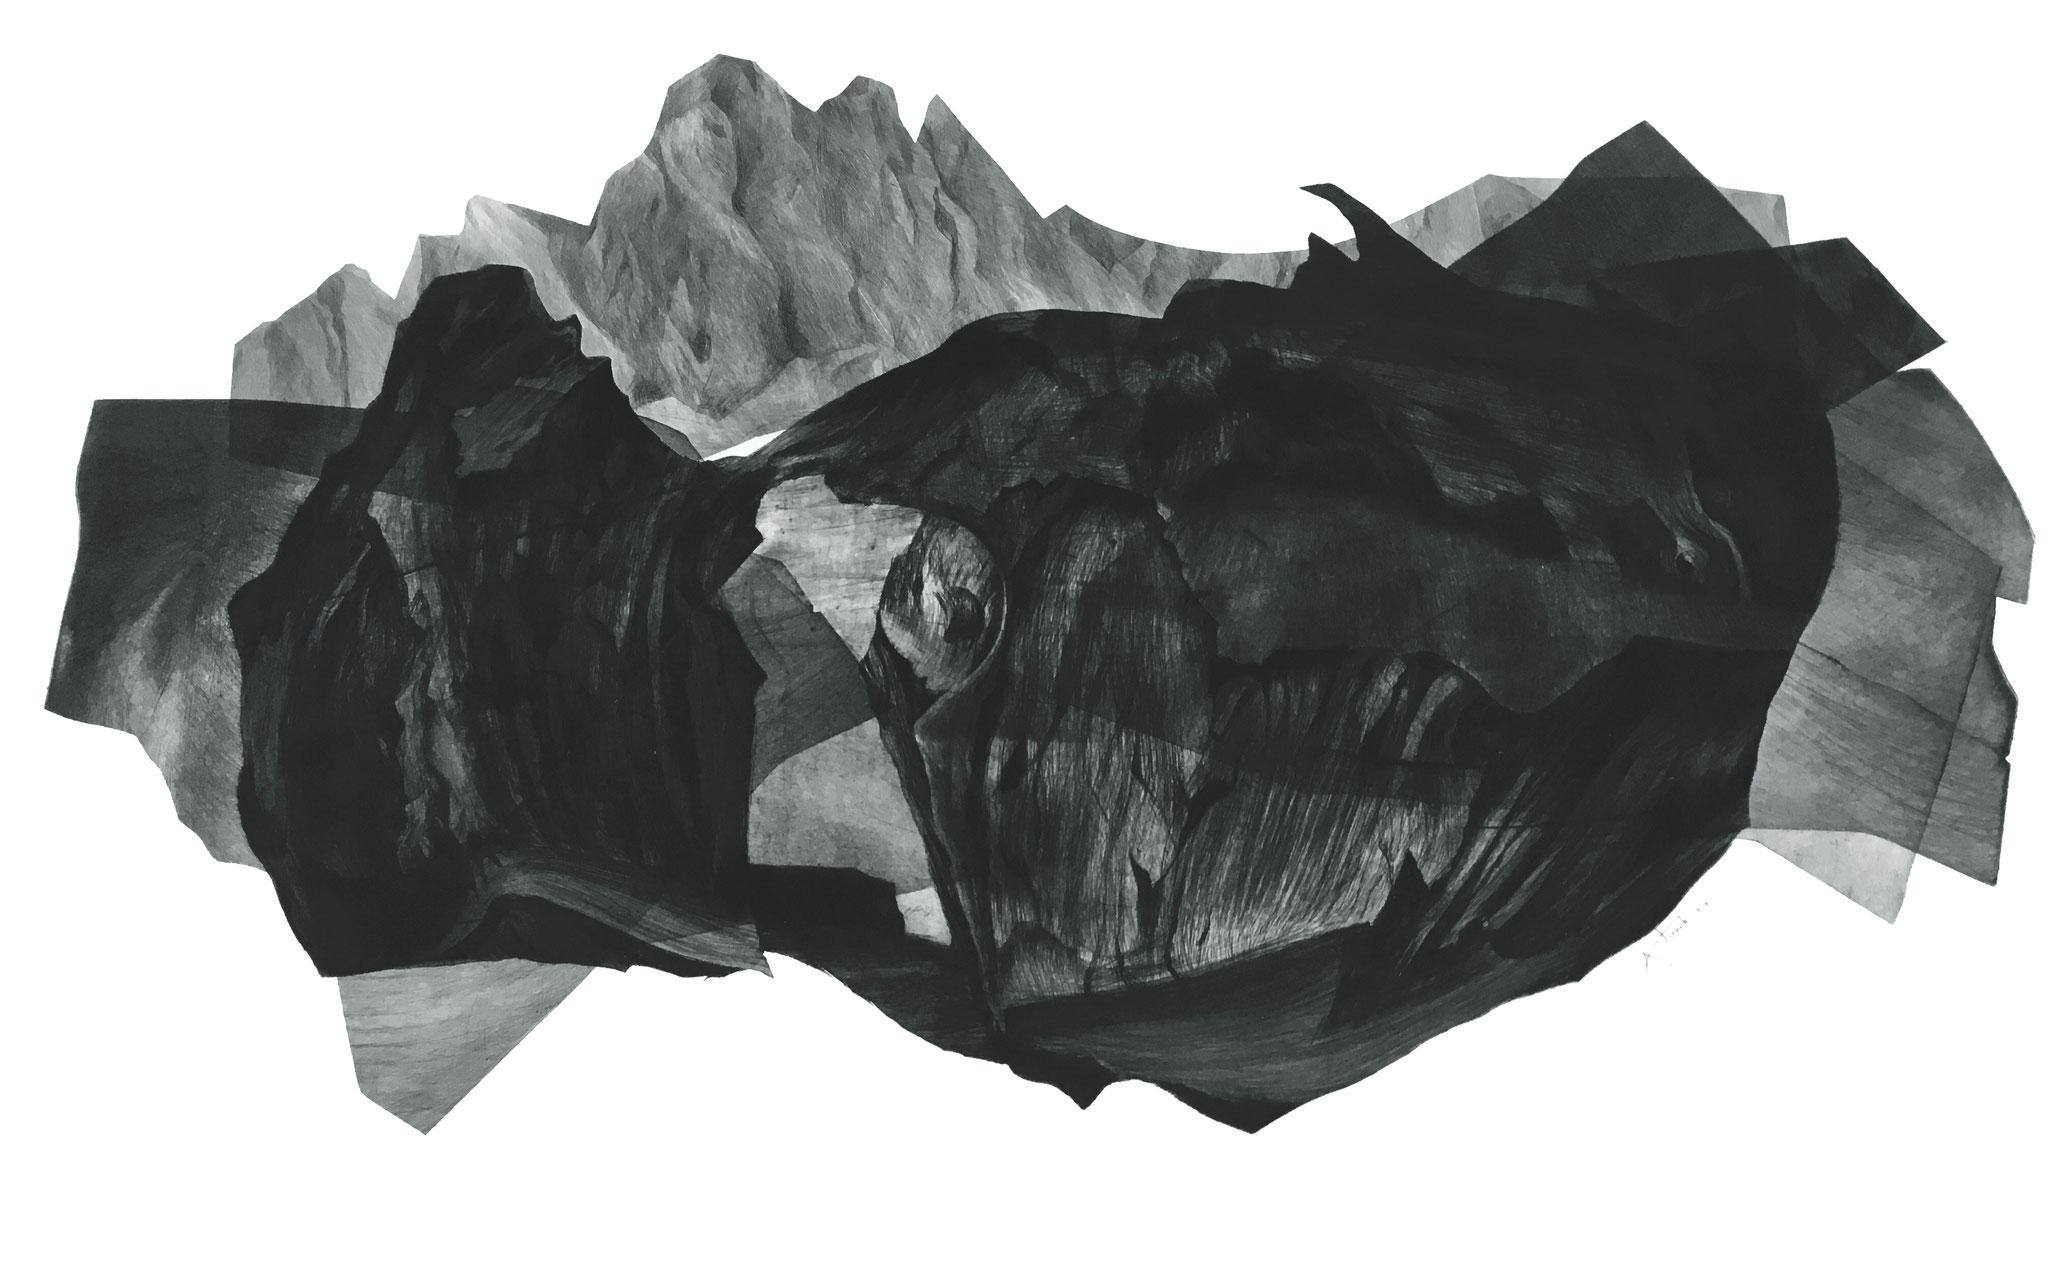 Les Enigmes I pointe sèche sur papier Fabriano I Epreuve d'artiste I 56 x 76 cm I 2017